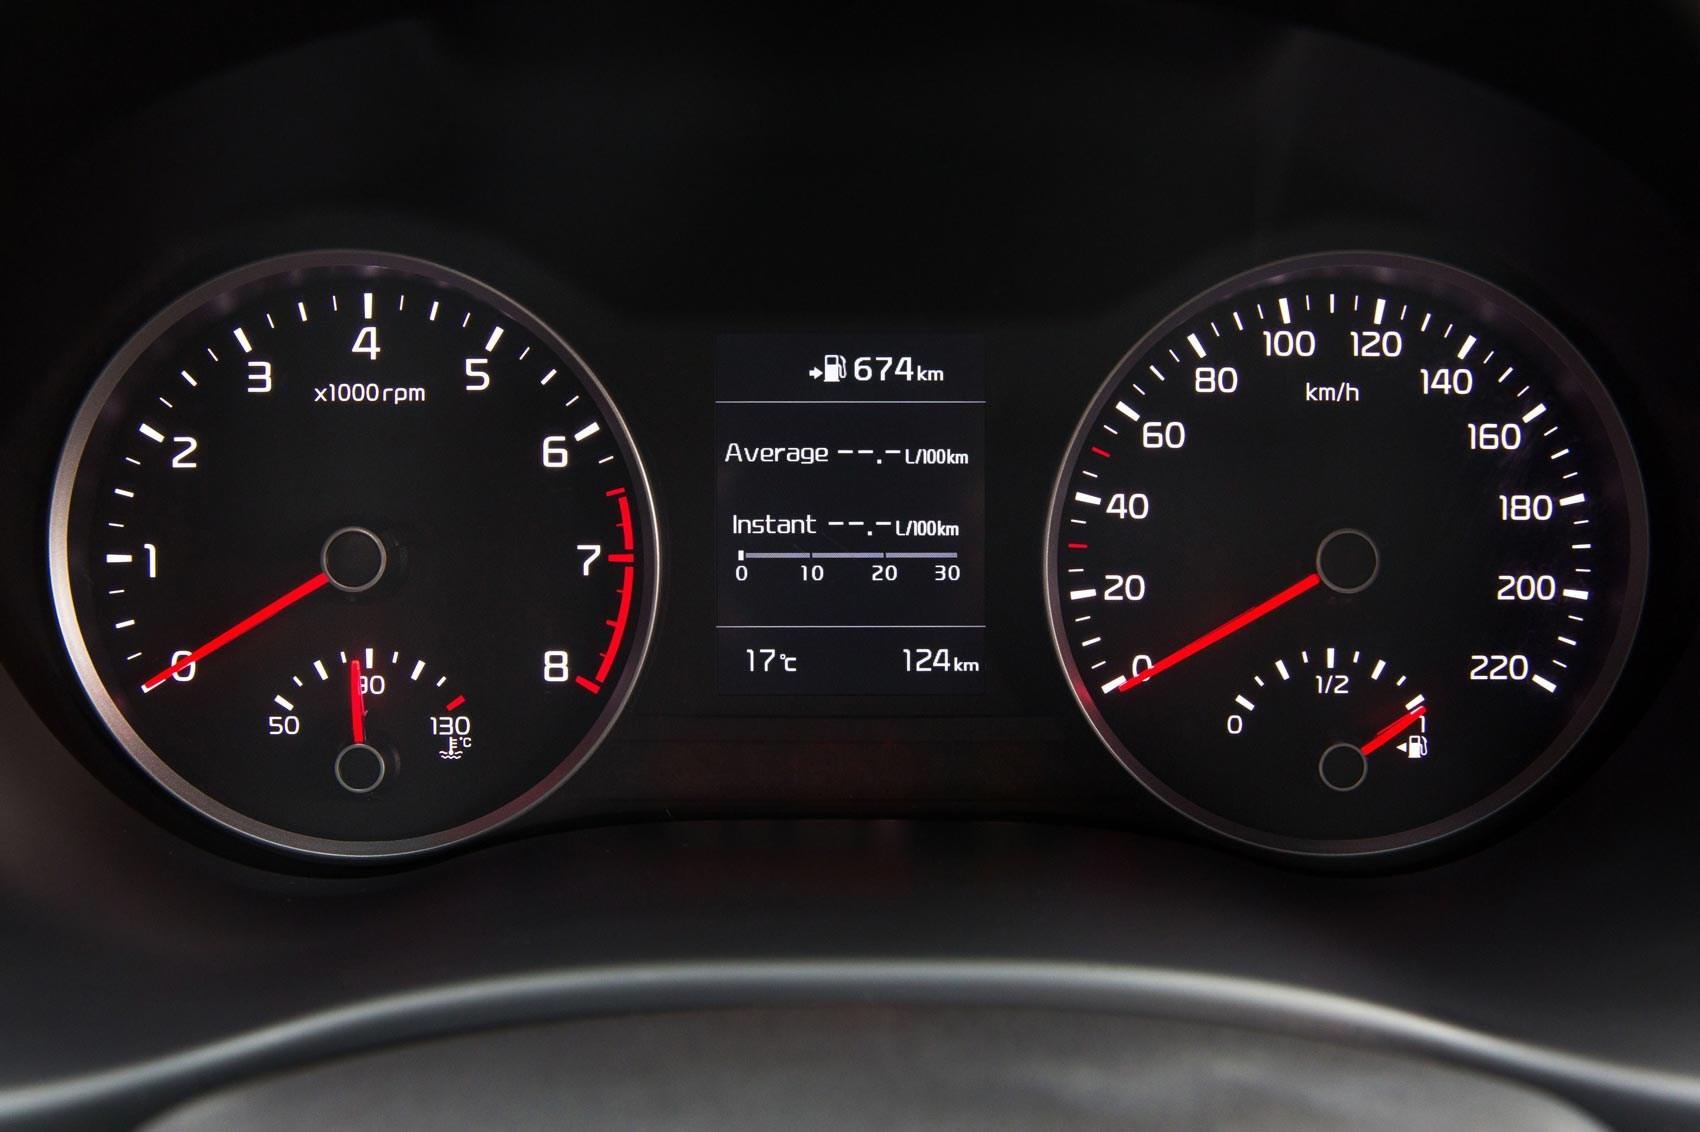 New Kia Rio revealed: latest on Kia's upcoming Fiesta rival